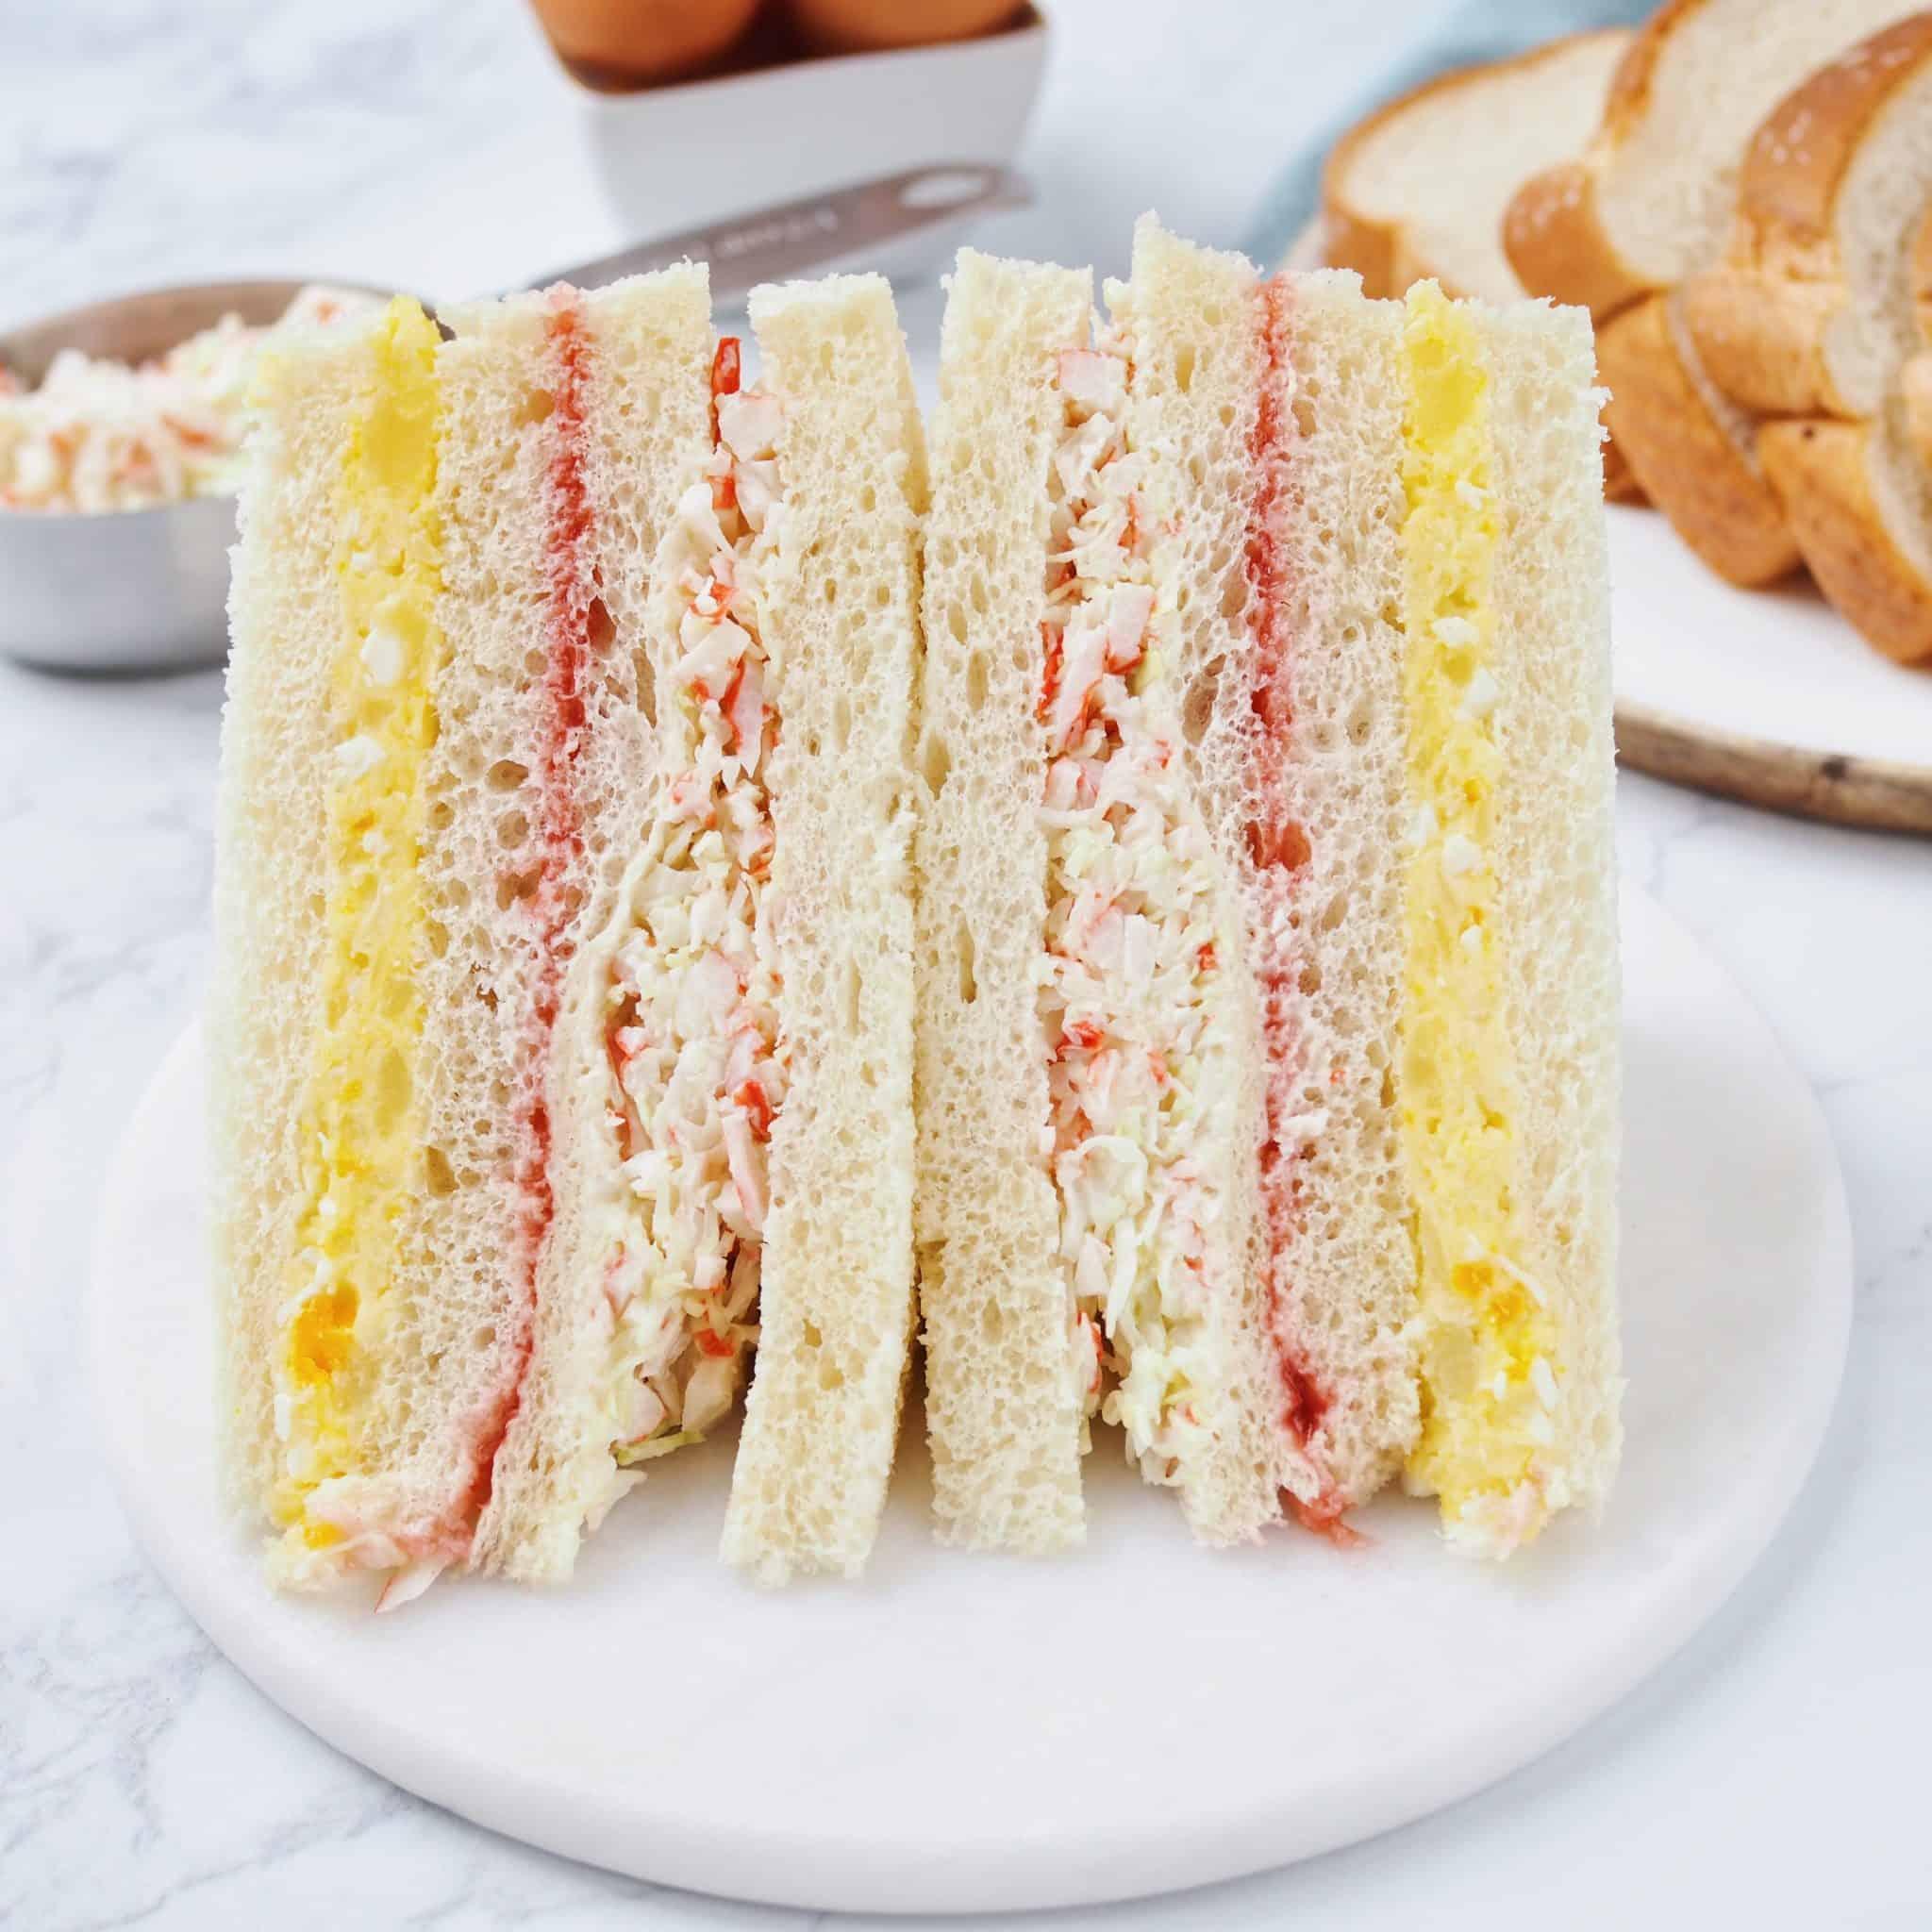 Inkigayo Sandwich (K-Pop Idol Sandwich) - Christie at Home